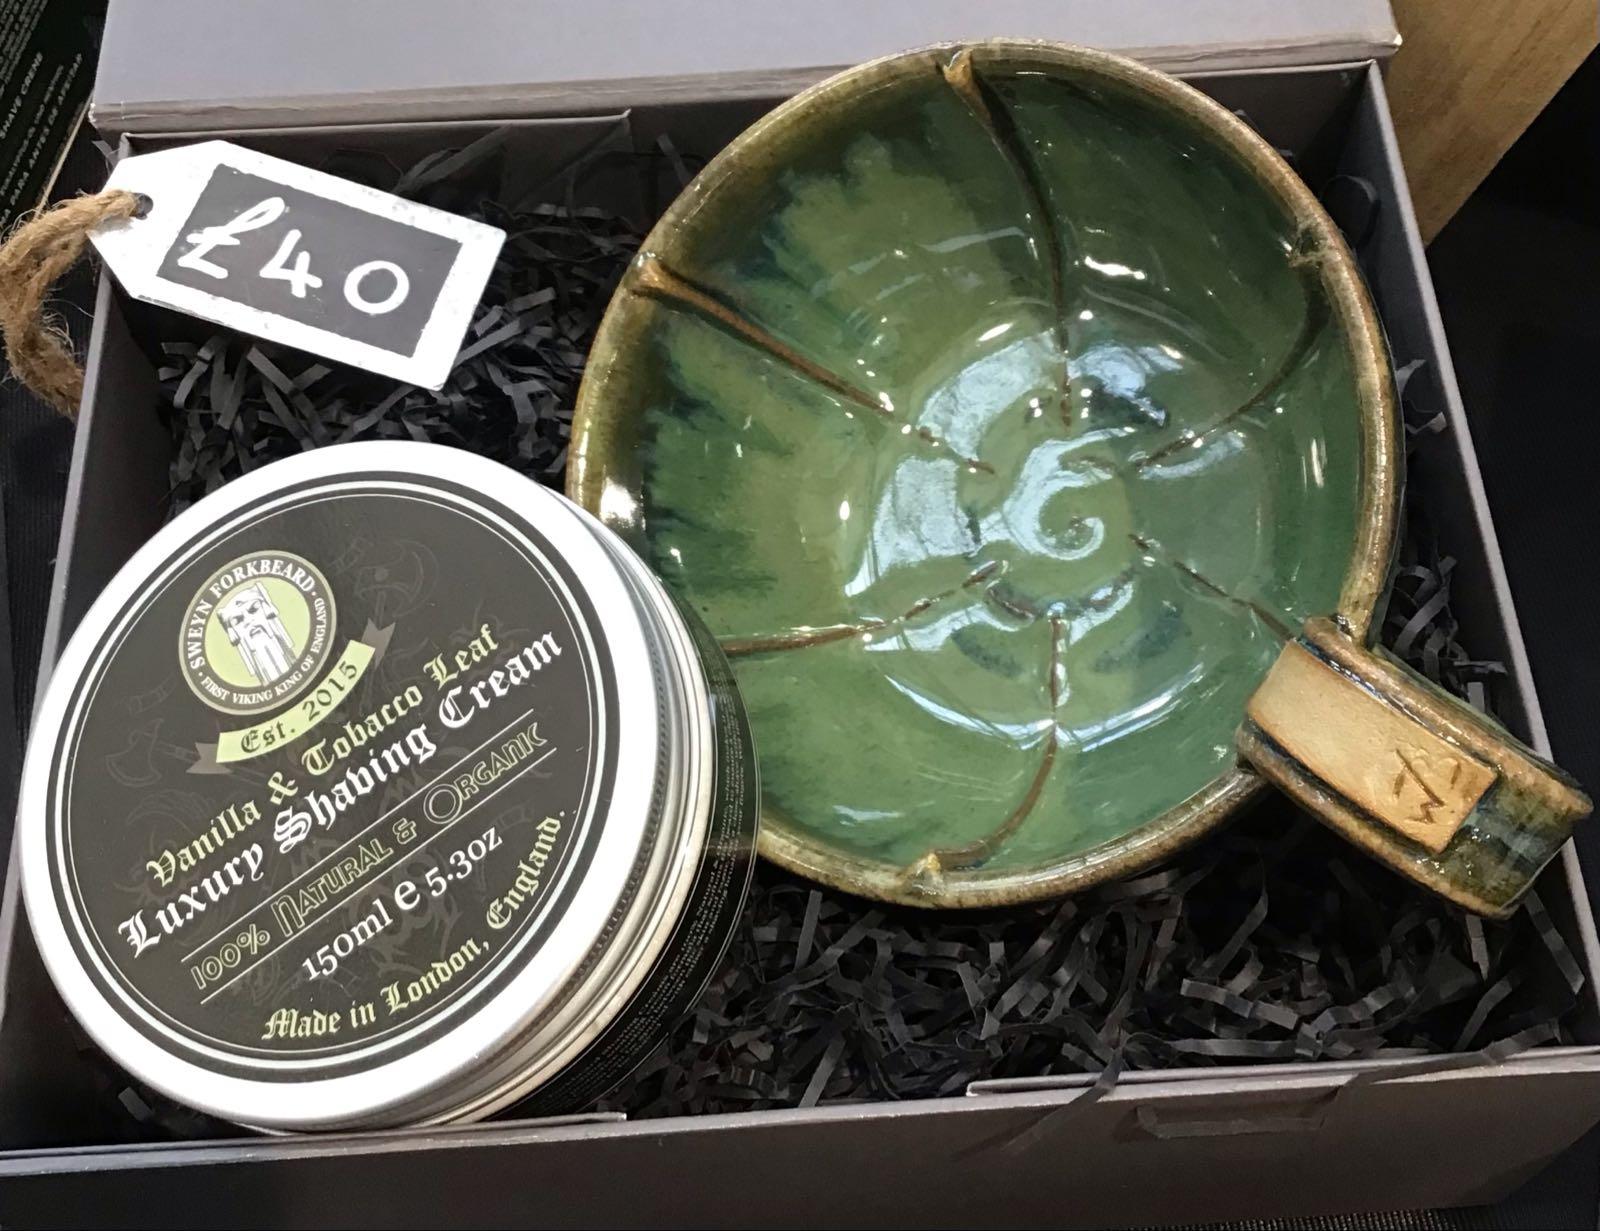 Shaving mug & shaving cream gift box